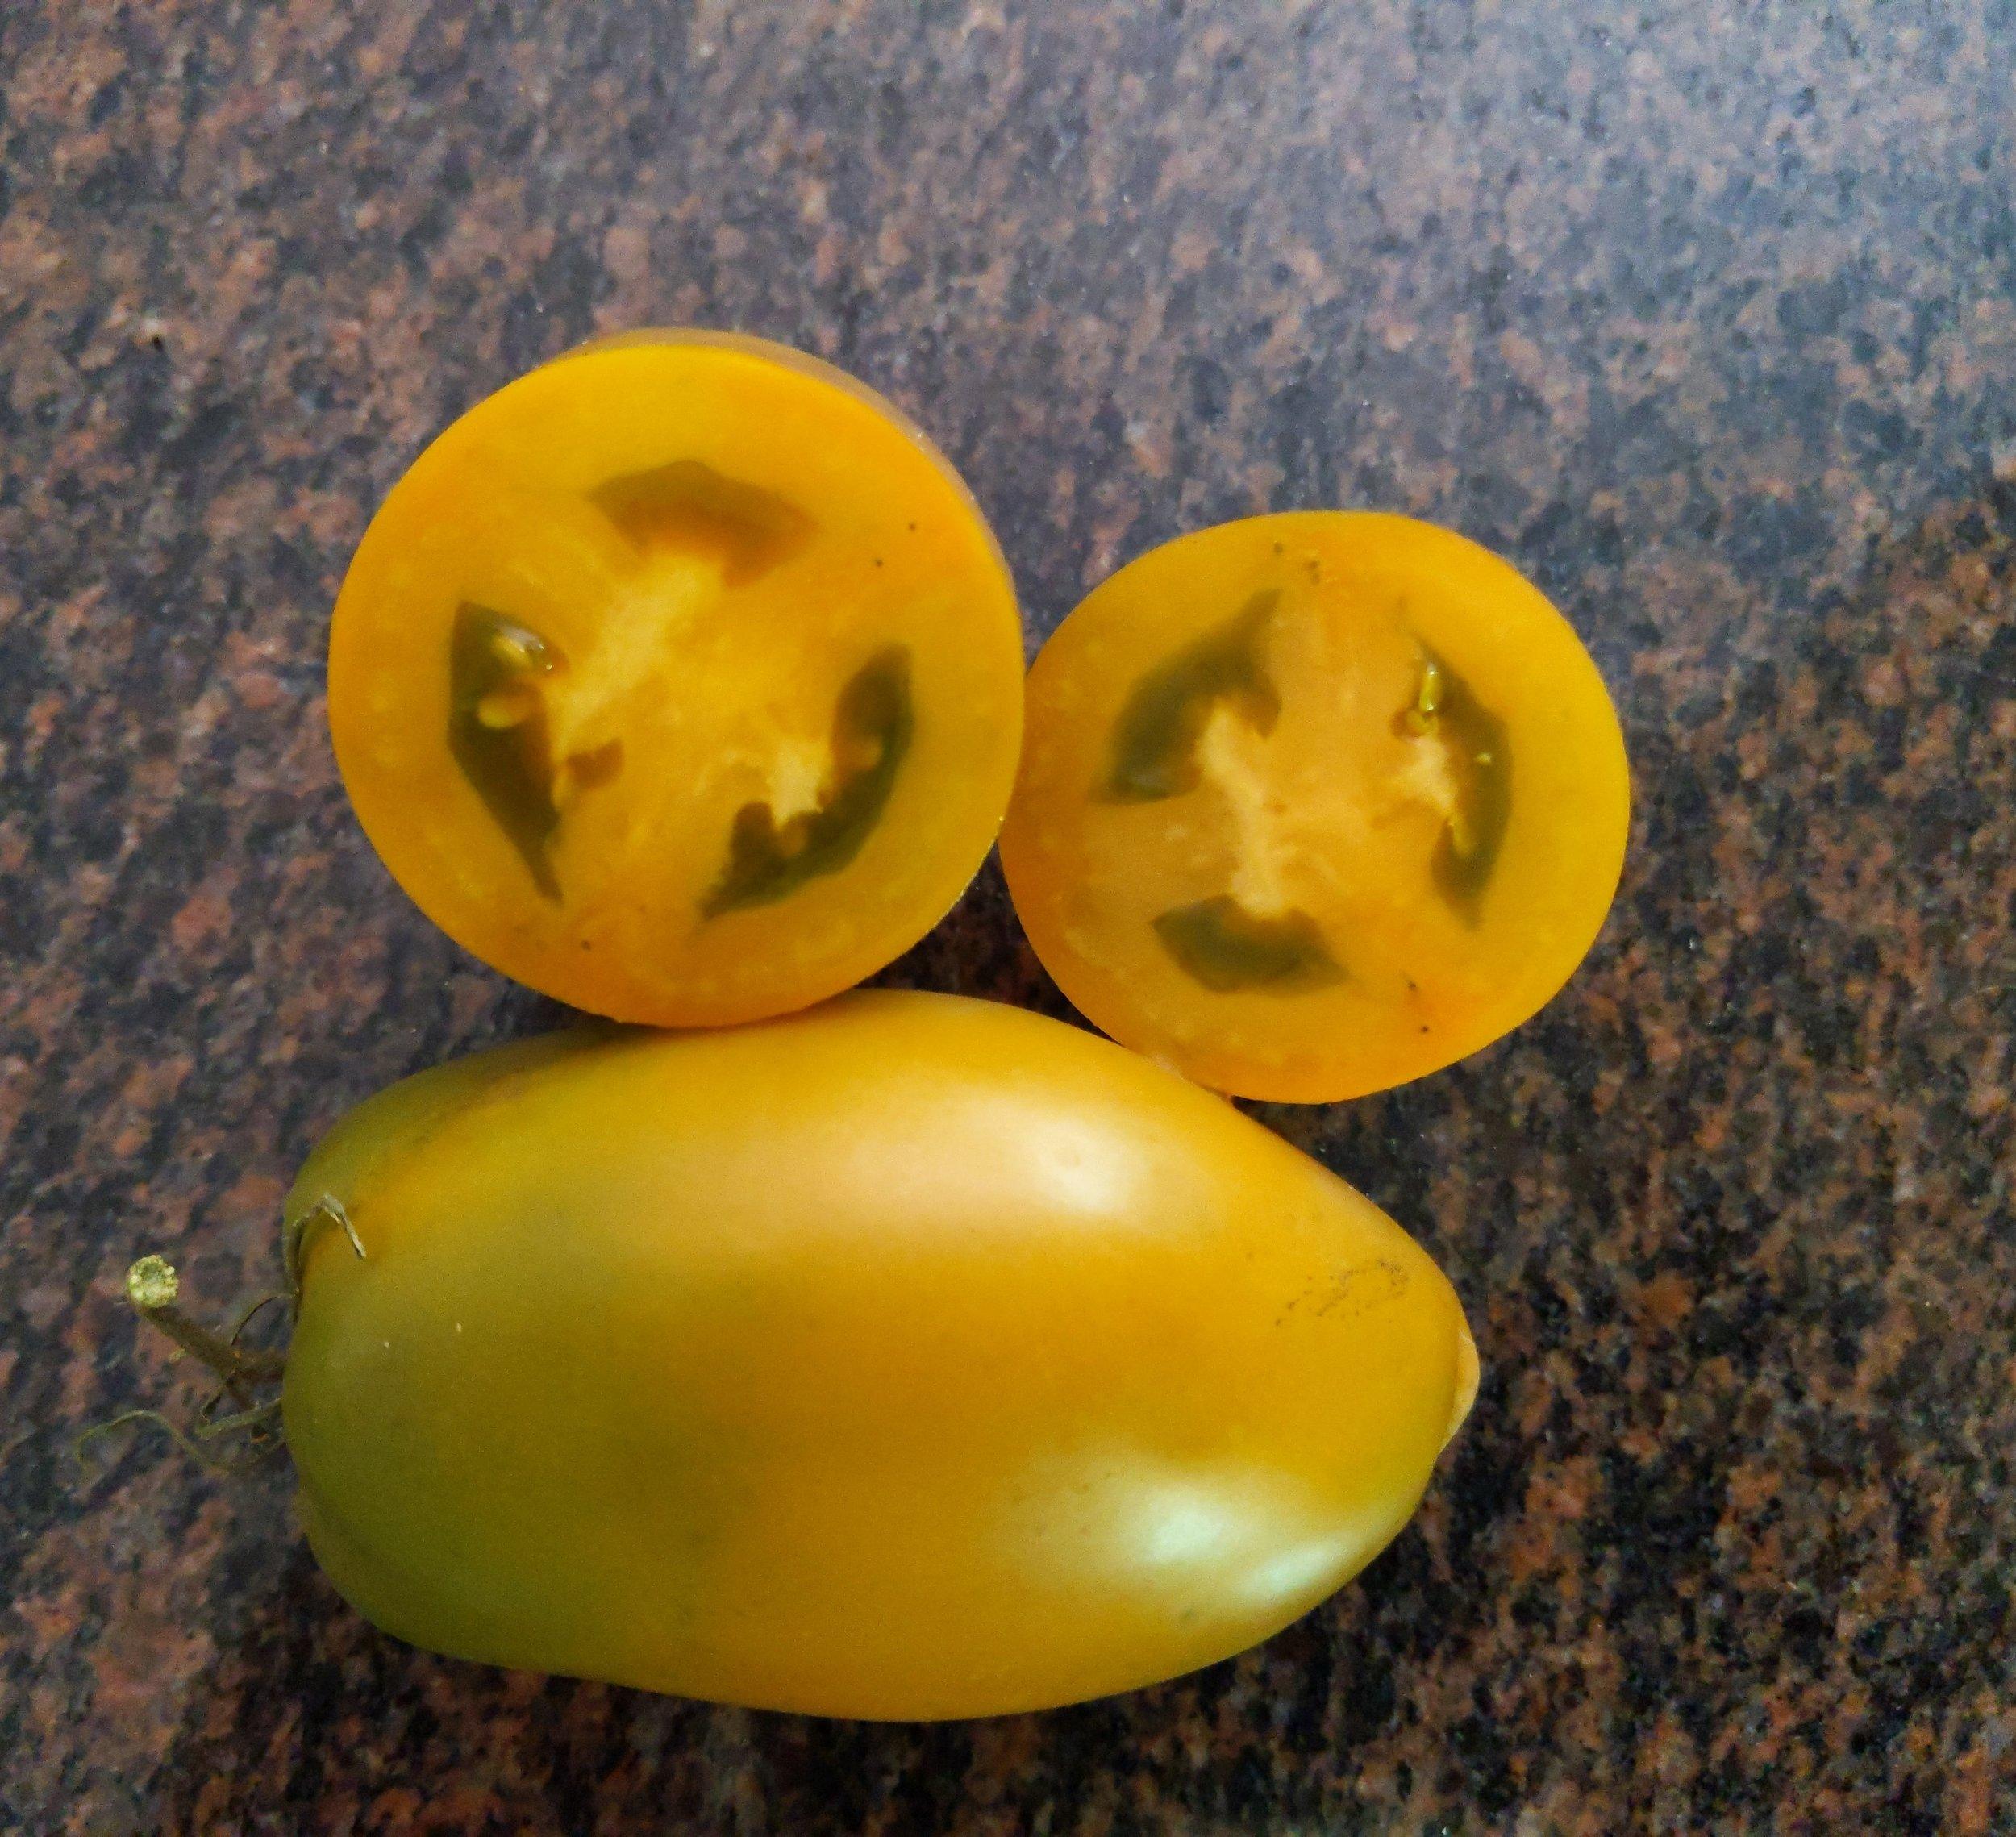 A wonderful recent Dwarf Tomato Project release, Dwarf Tiger Eye